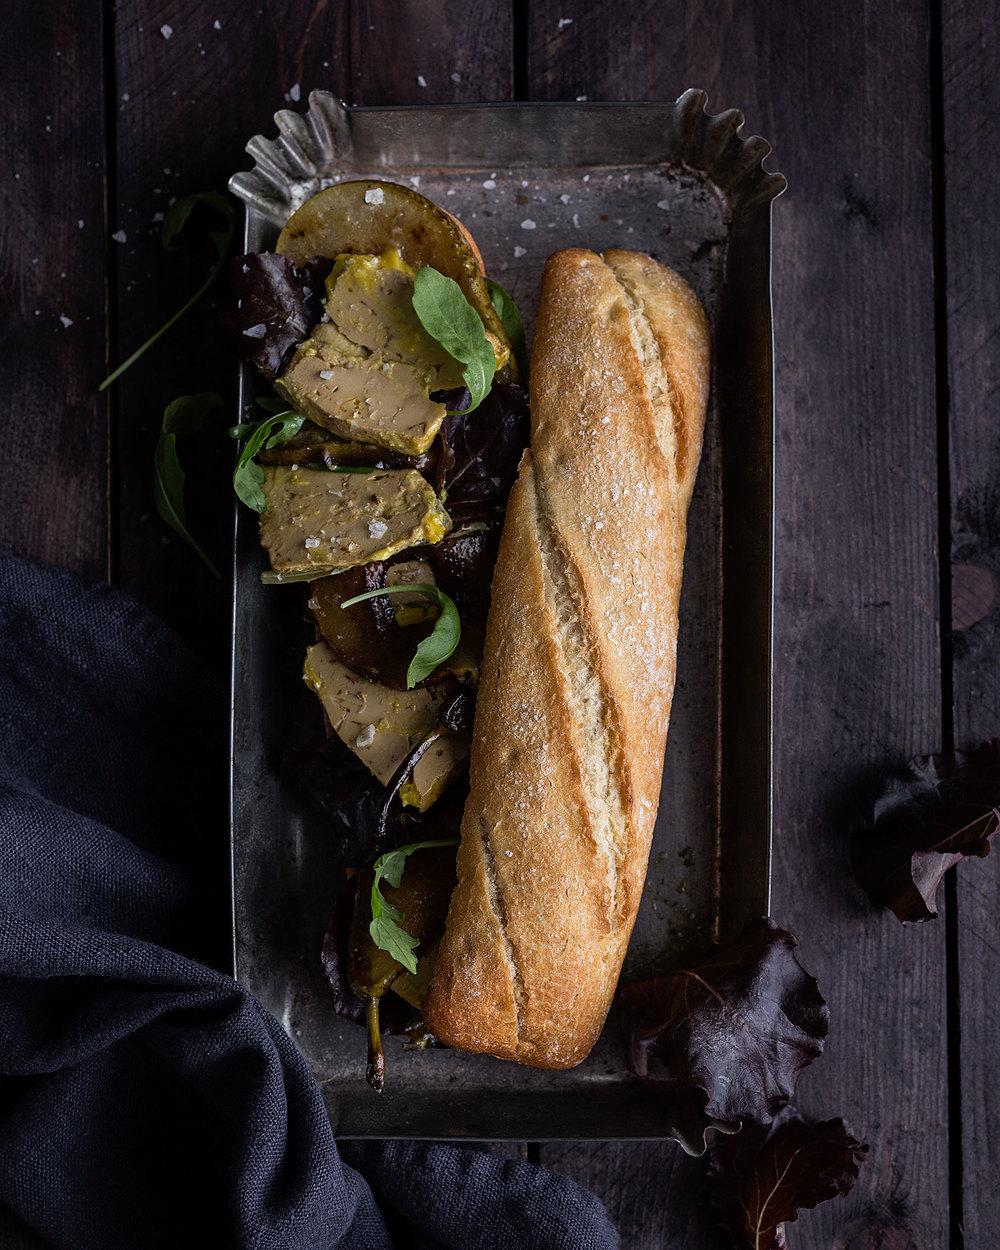 corina-landa-food-photography-fotografia-gastronomica-27.jpg